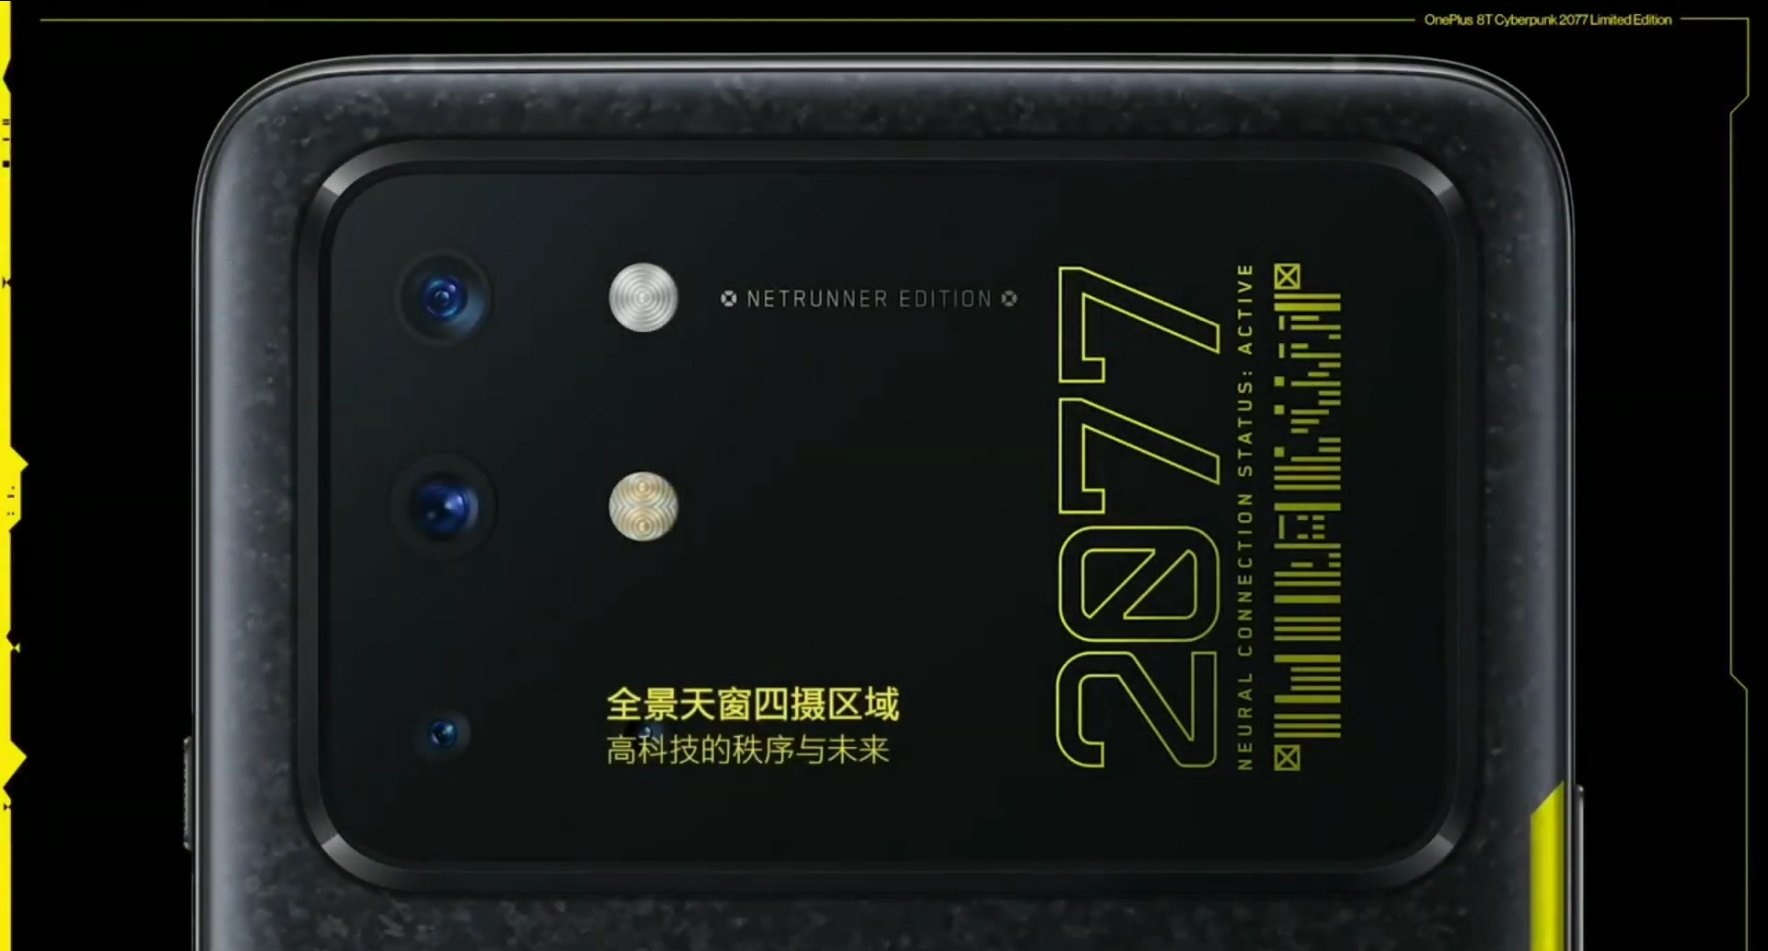 OnePlus 8T Cyberpunk 2077 Edition Camera